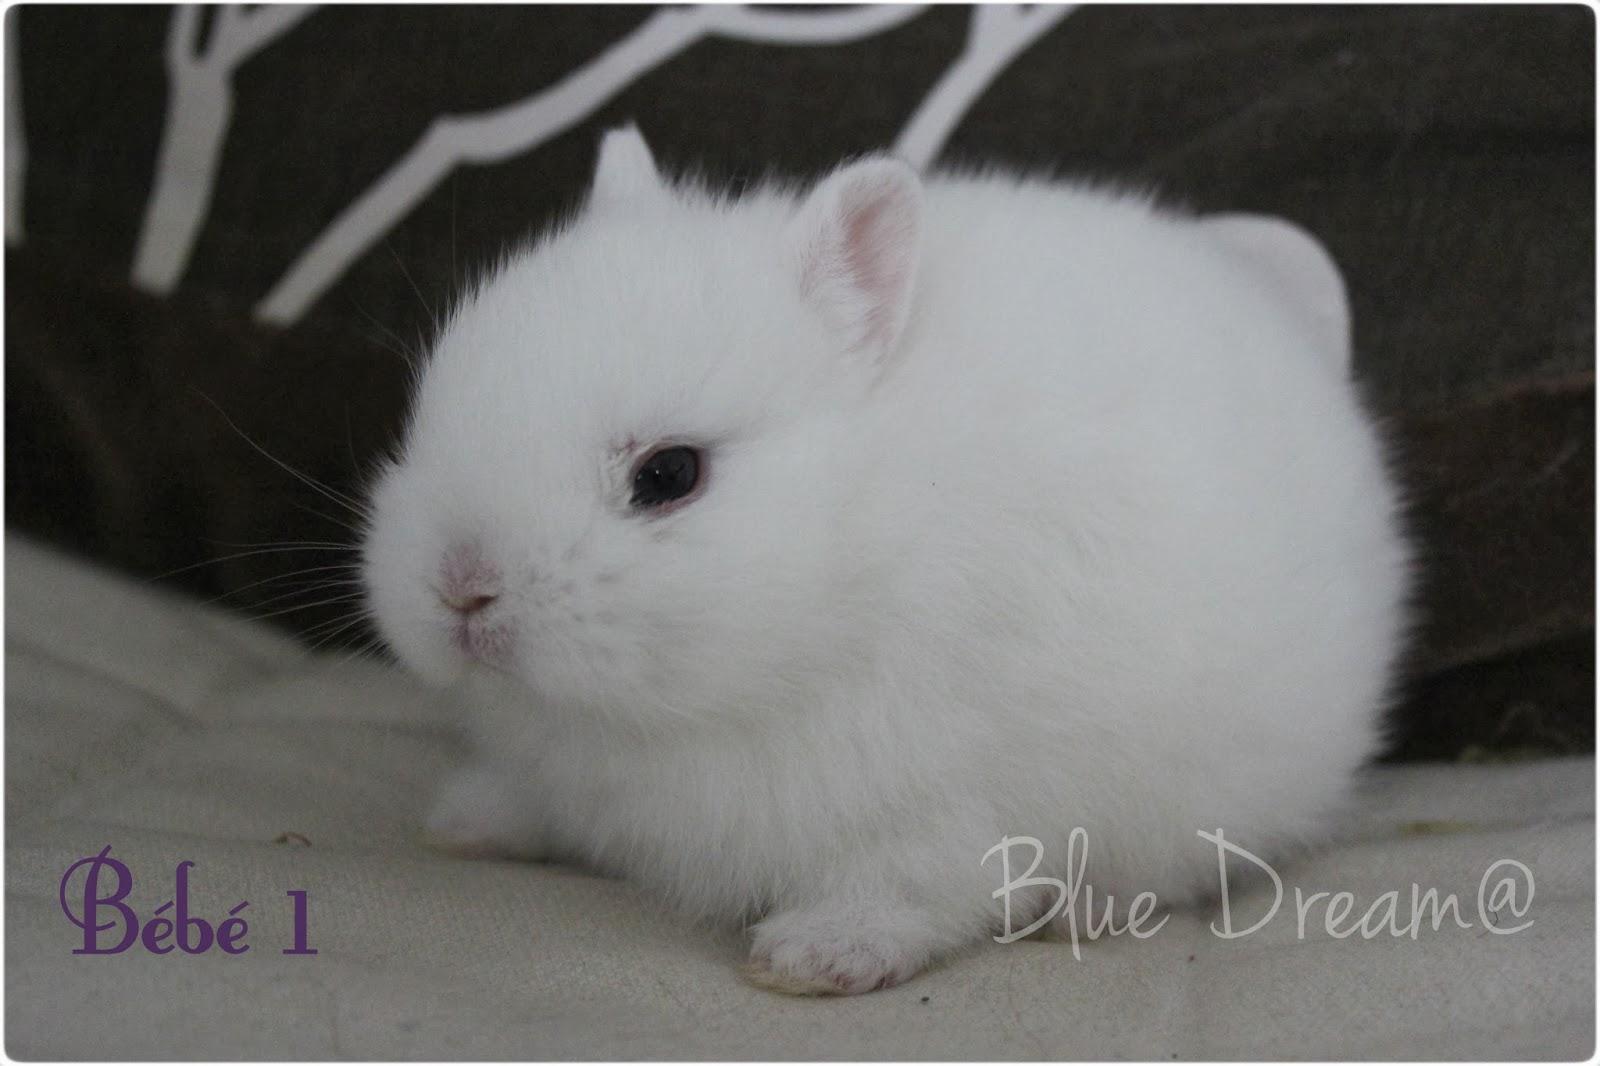 bebe lapin polonais yeux bleus